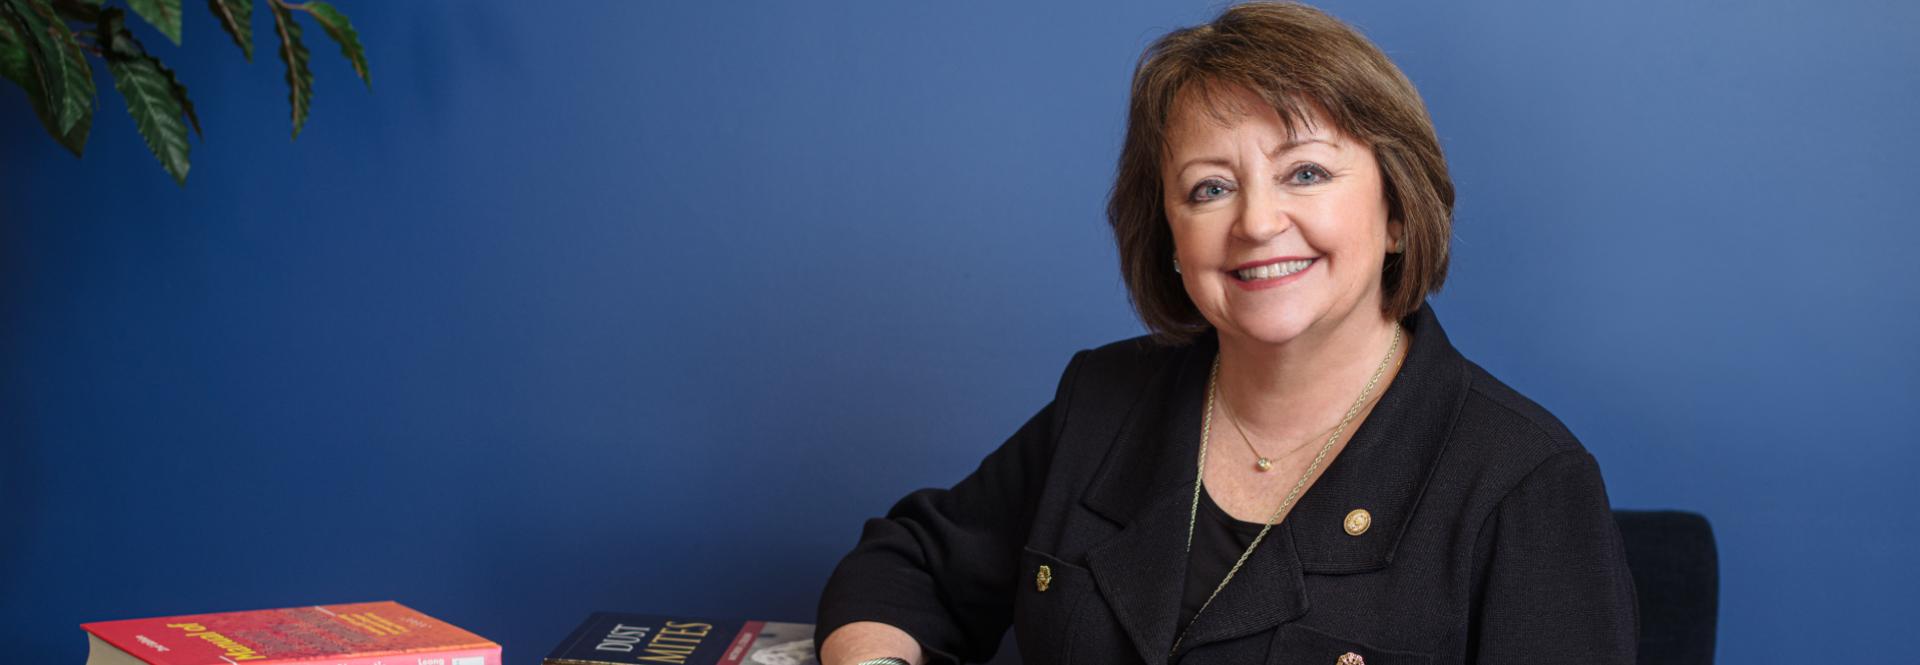 Dr. Susan Rudd Bailey